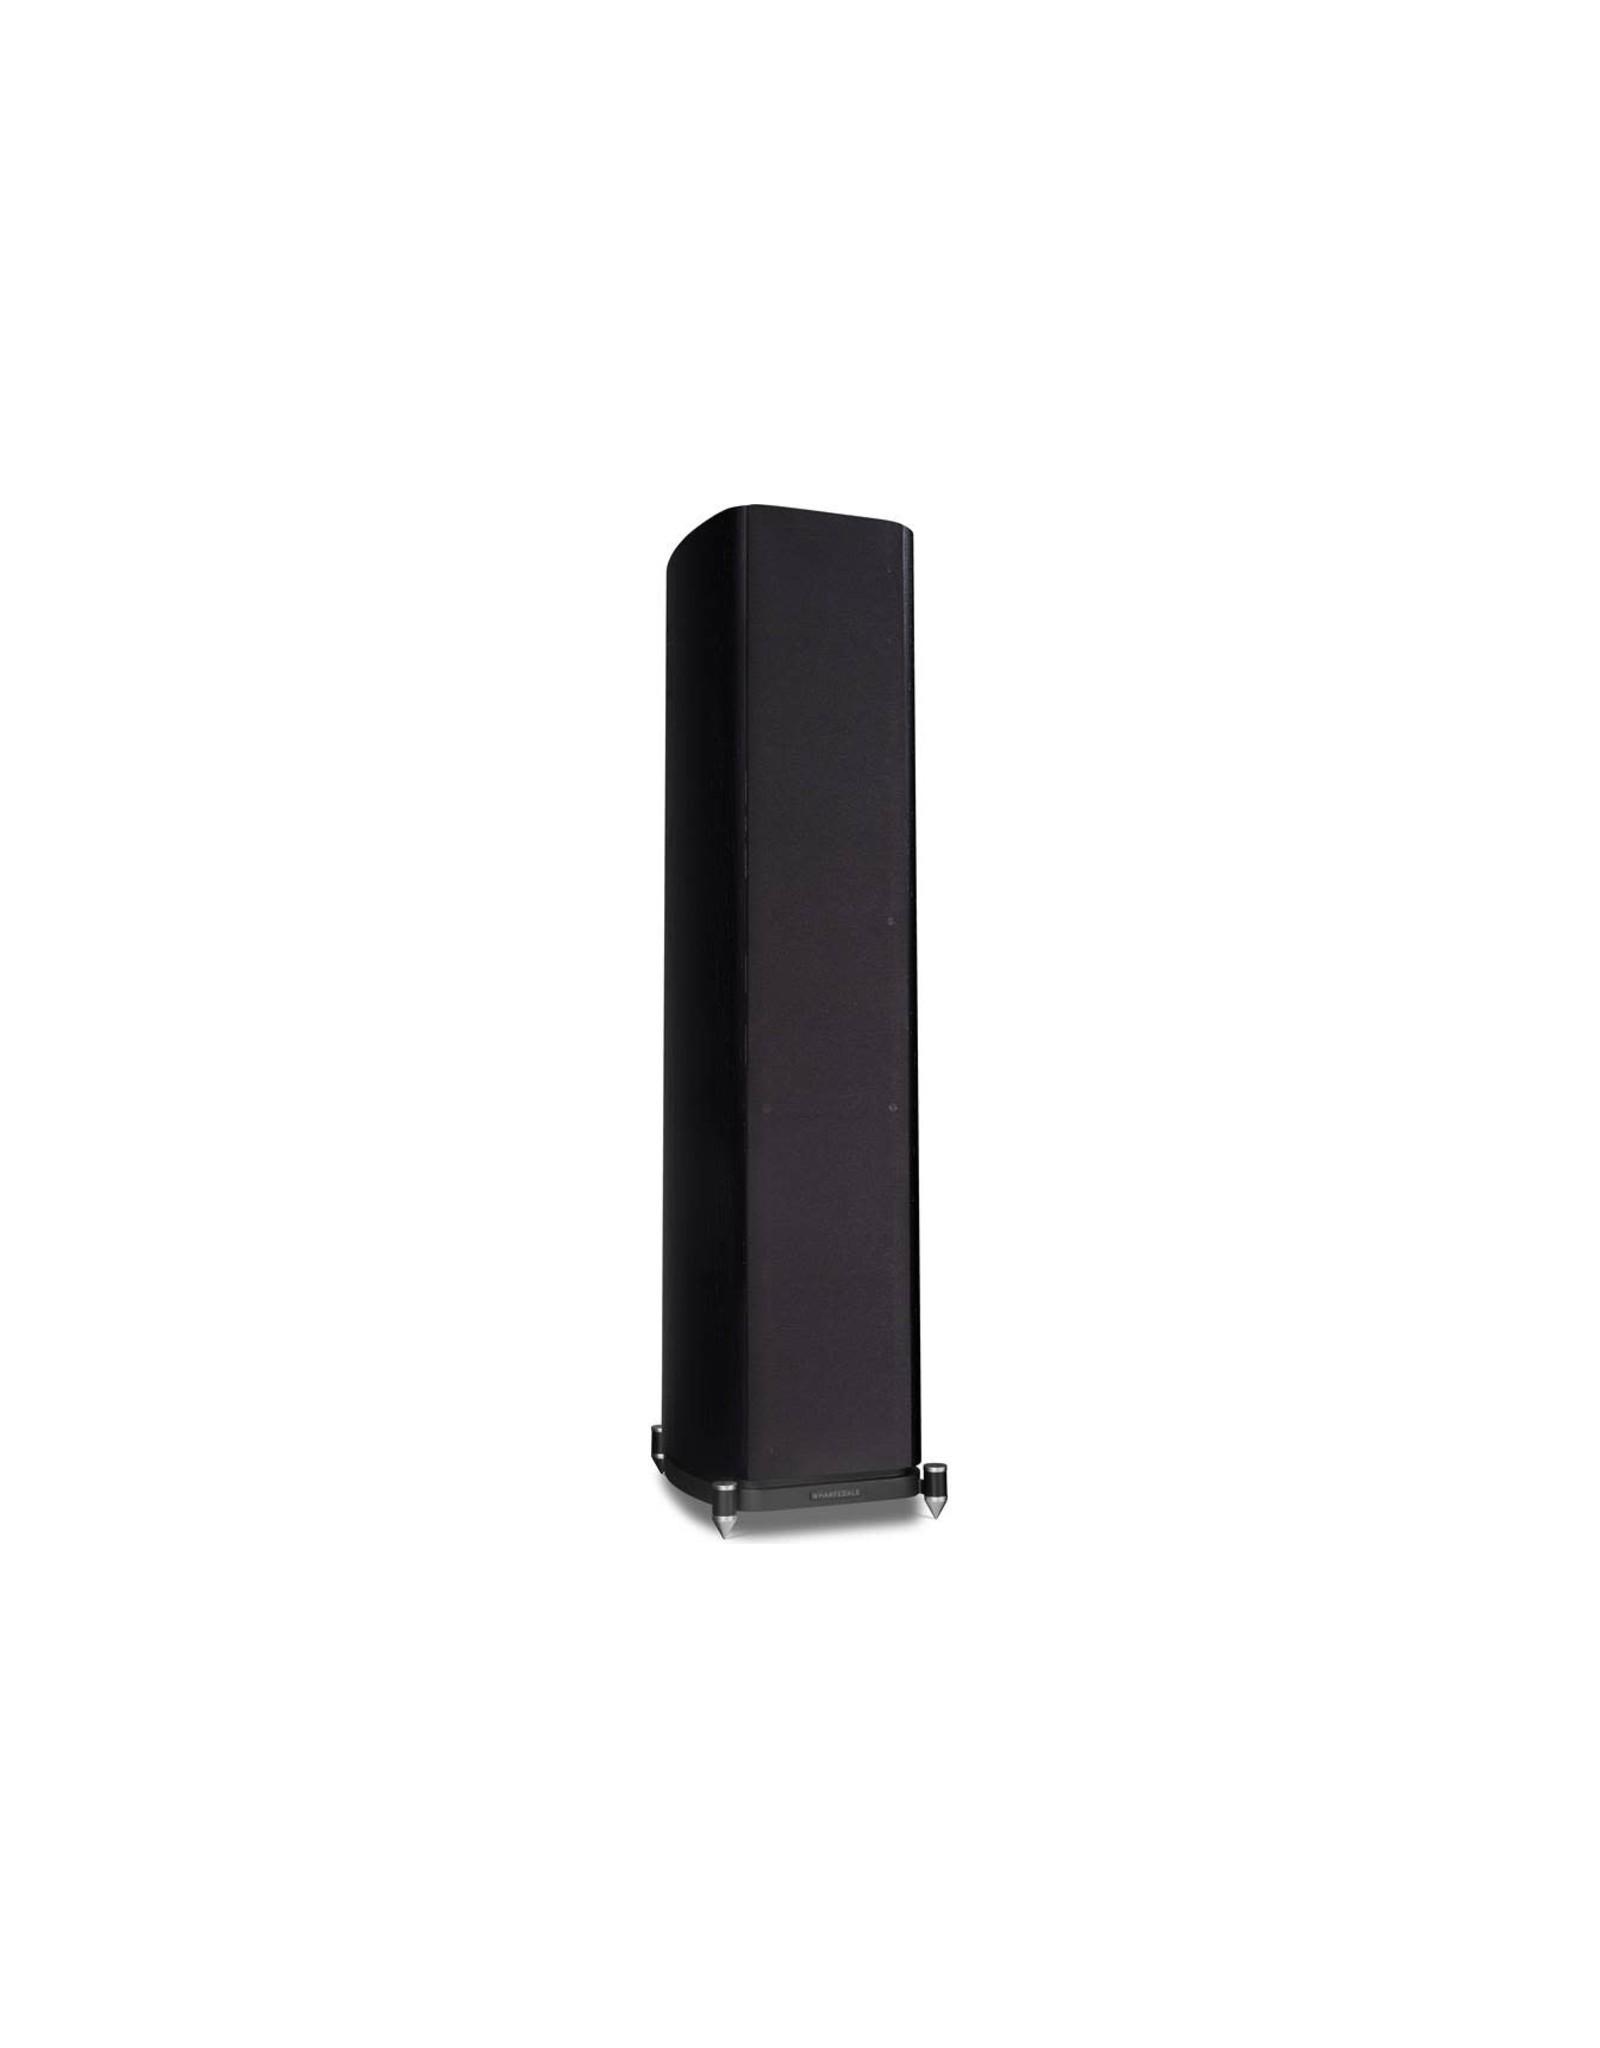 Wharfedale Wharfedale EVO4.4 Floorstanding Speakers